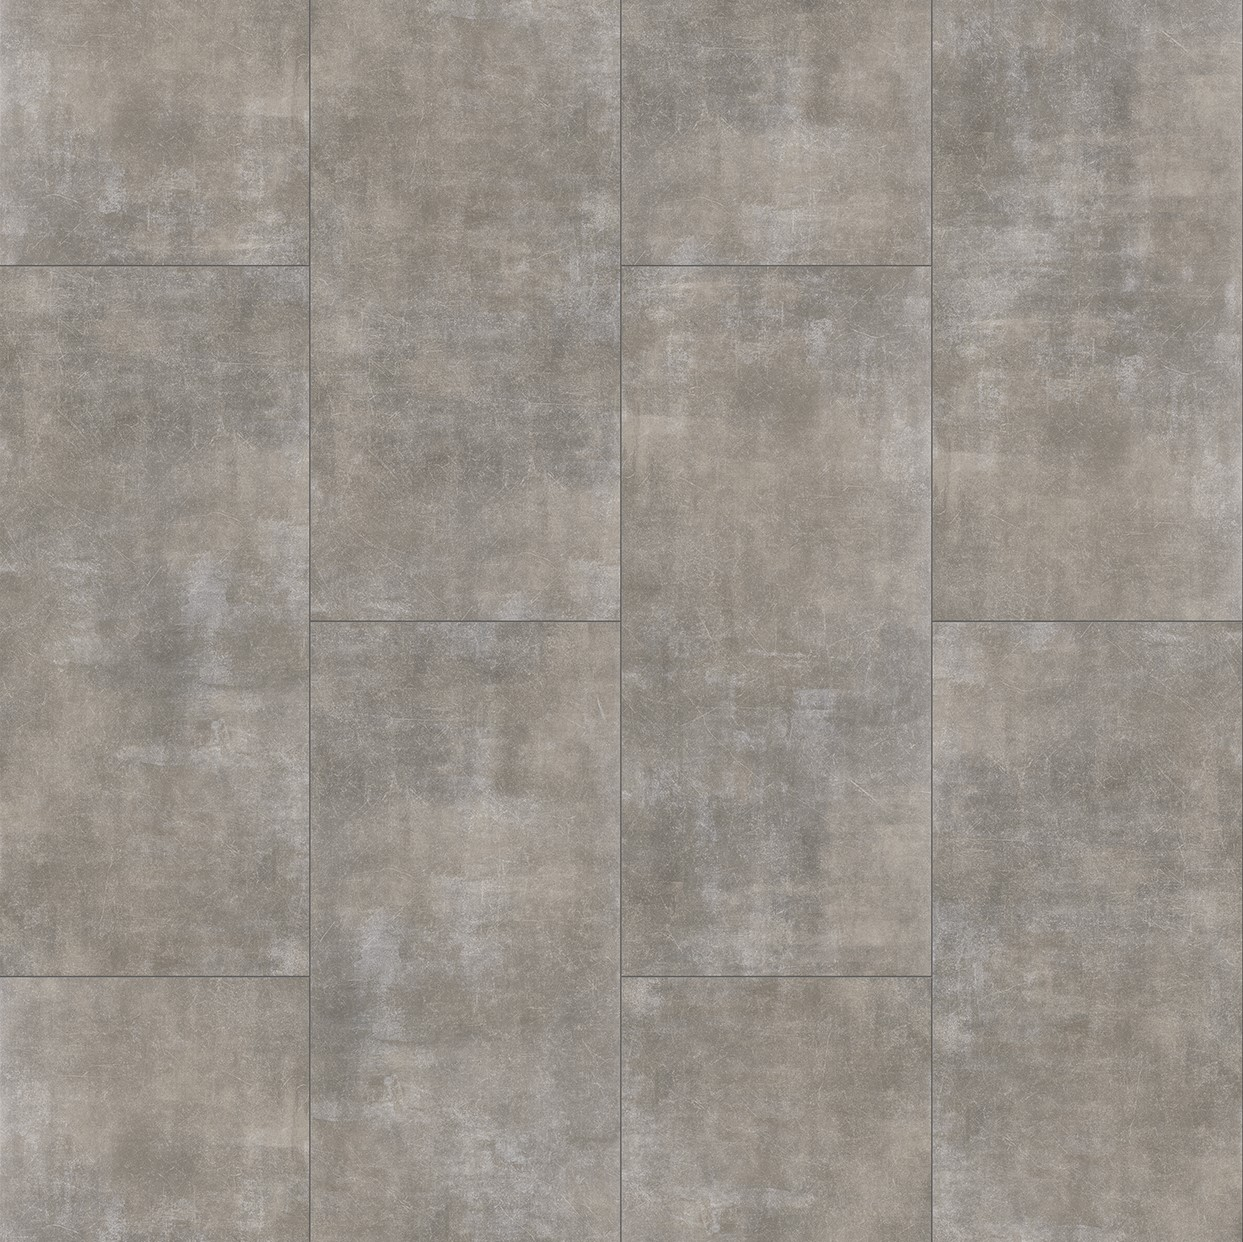 Fliese Modern Grey